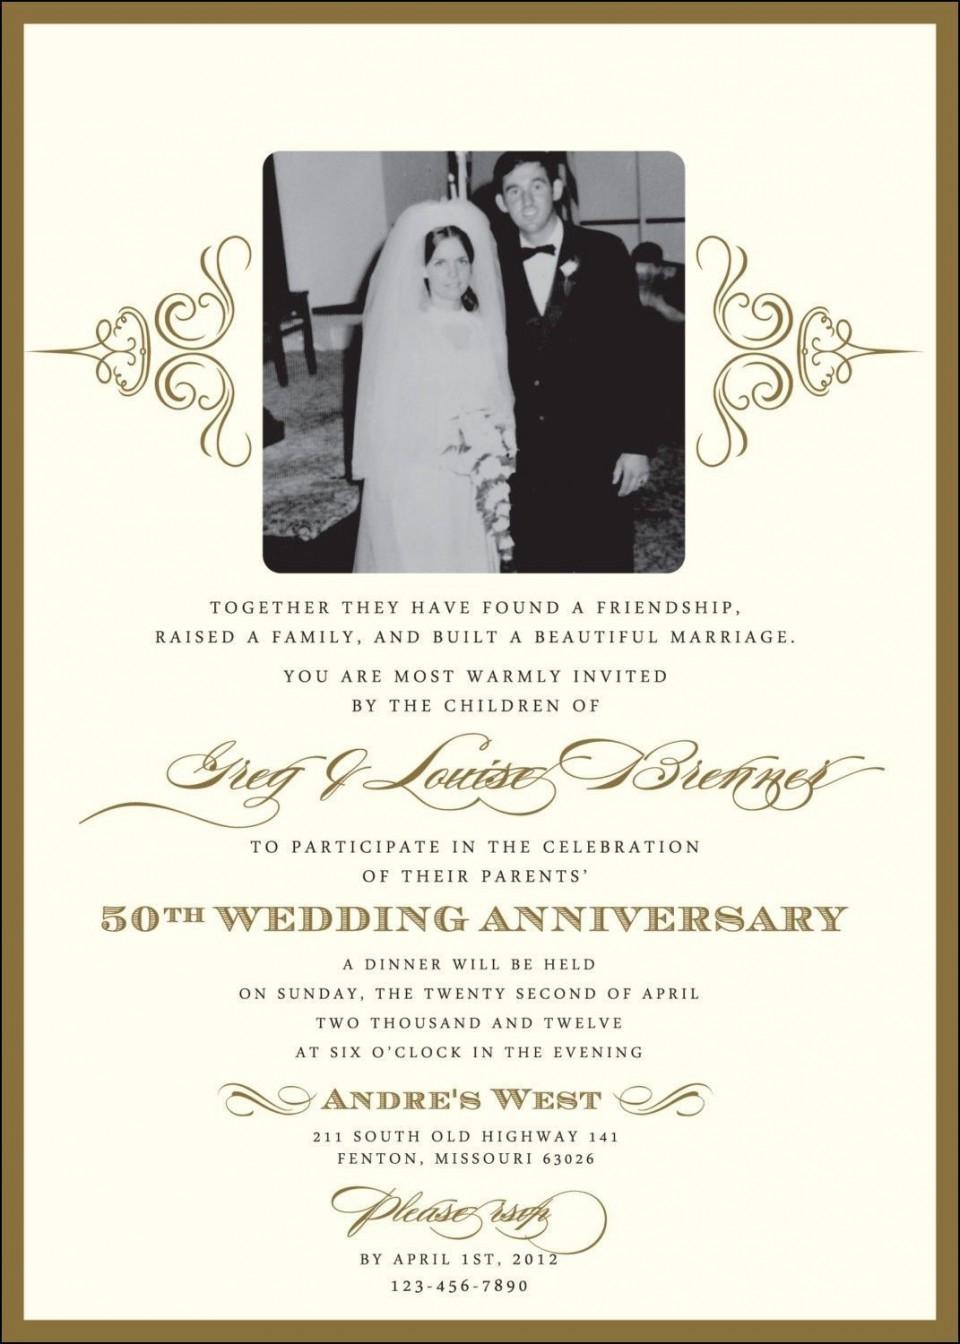 004 Dreaded 50th Anniversary Invitation Wording Sample High Definition  Wedding 60th In Tamil Birthday960